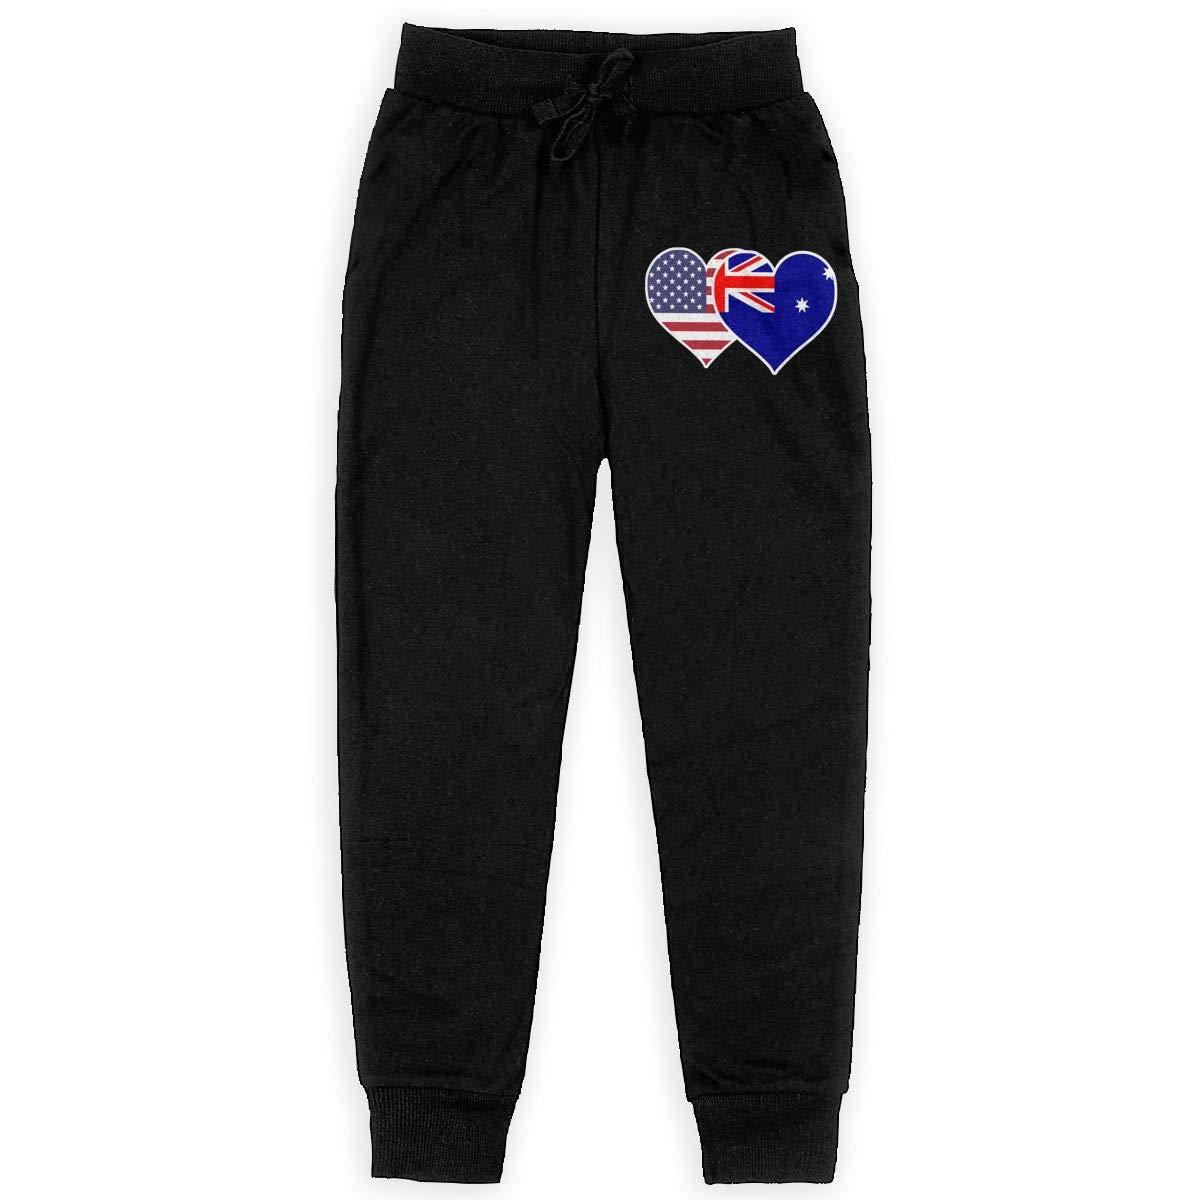 Teenager Sweat Pant for Teenager Girls WYZVK22 American Australian Flag Heart Soft//Cozy Sweatpants